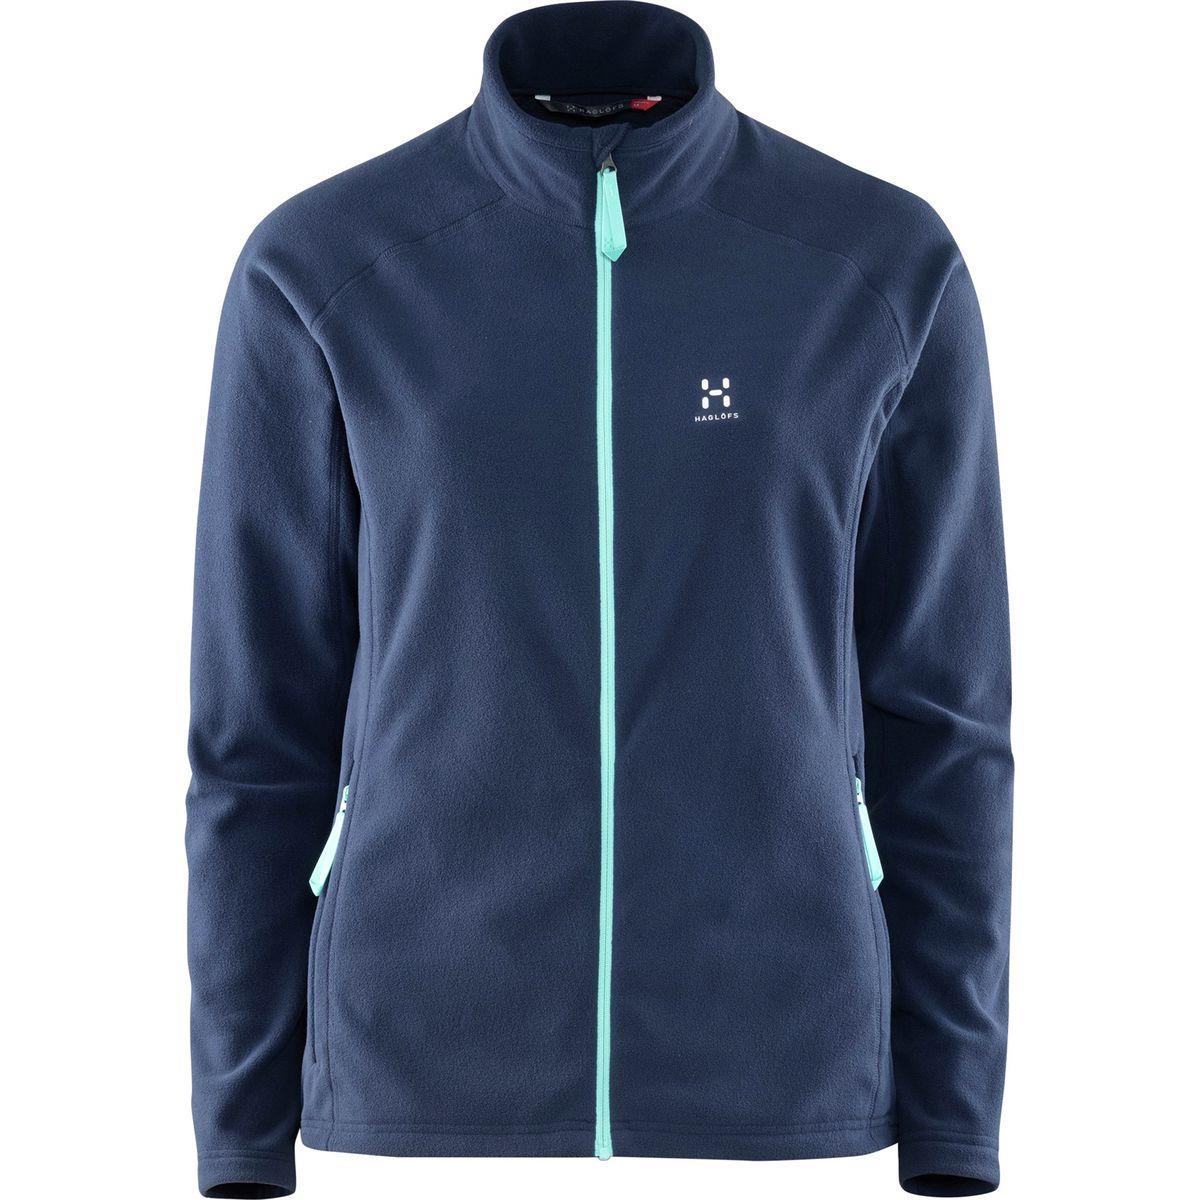 Hagl Astro II Fleece Jacket - Women